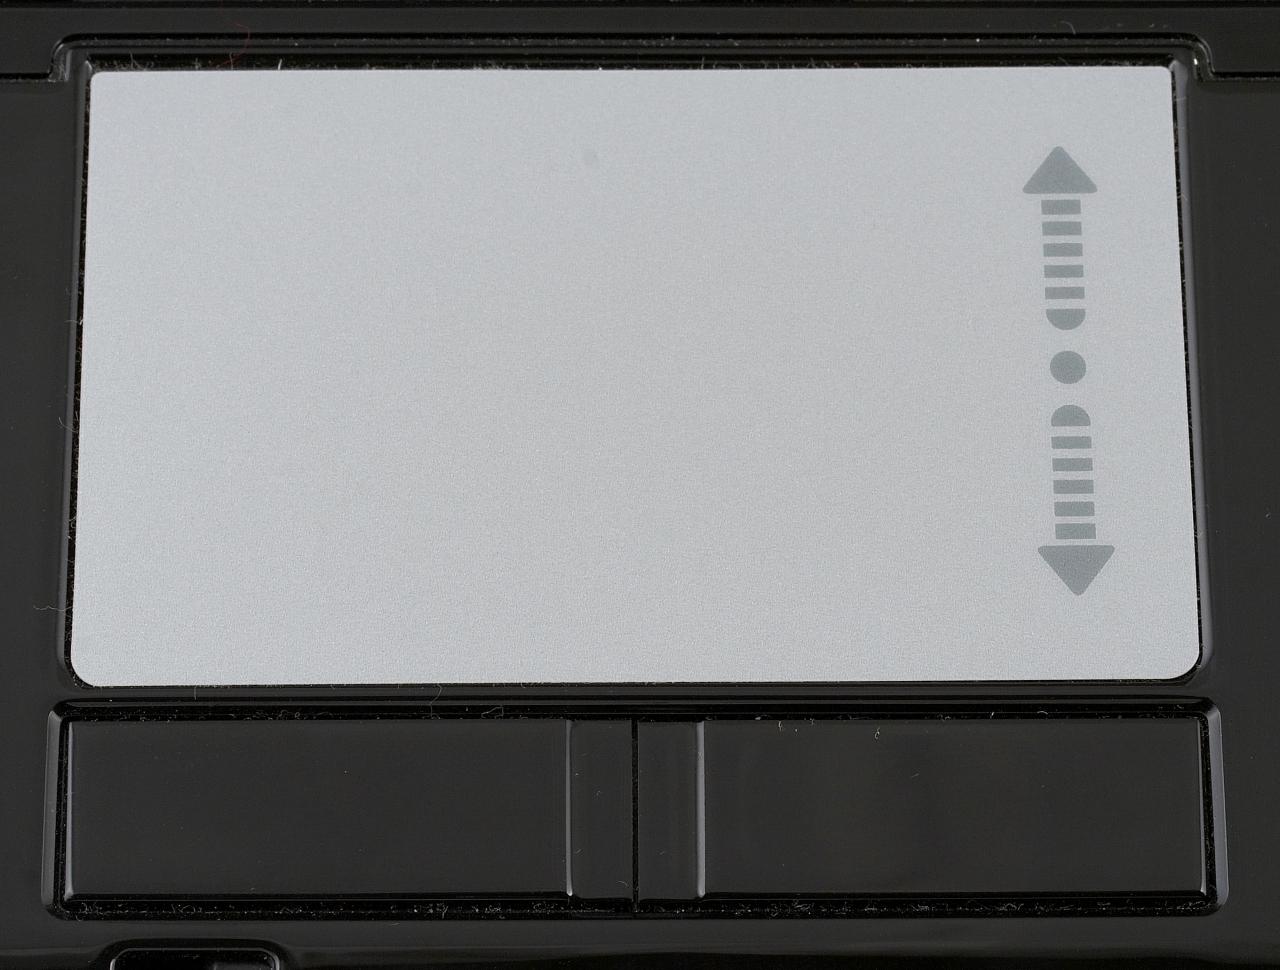 MSI GX610 Wireless LAN Drivers for Mac